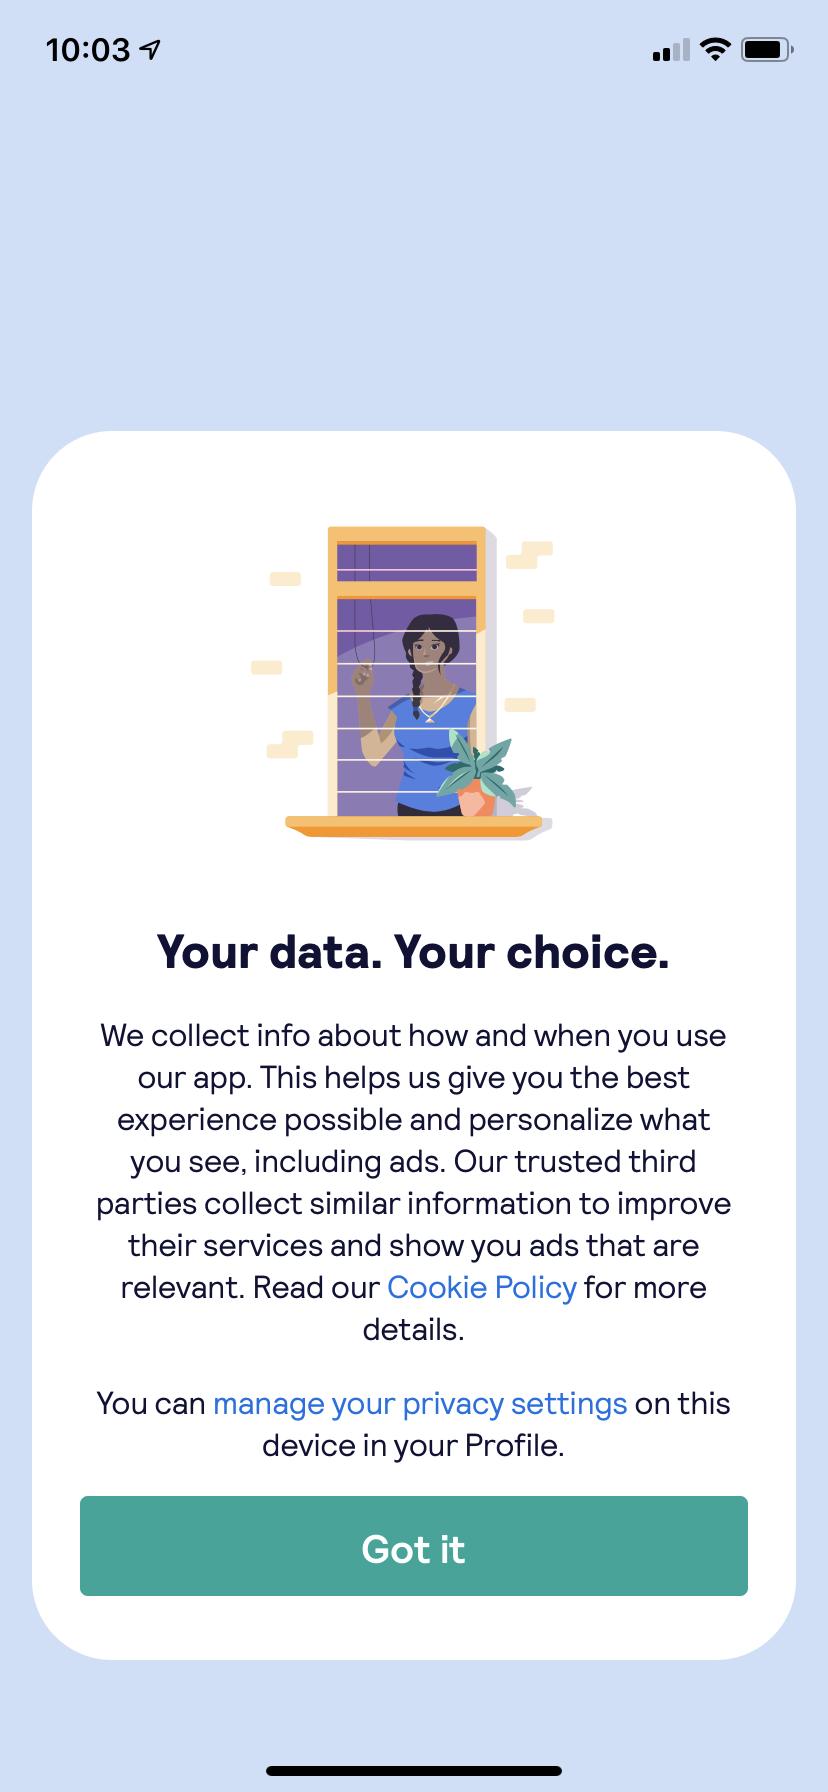 skyscanner mobile app data privacy fullscreen modal window second version